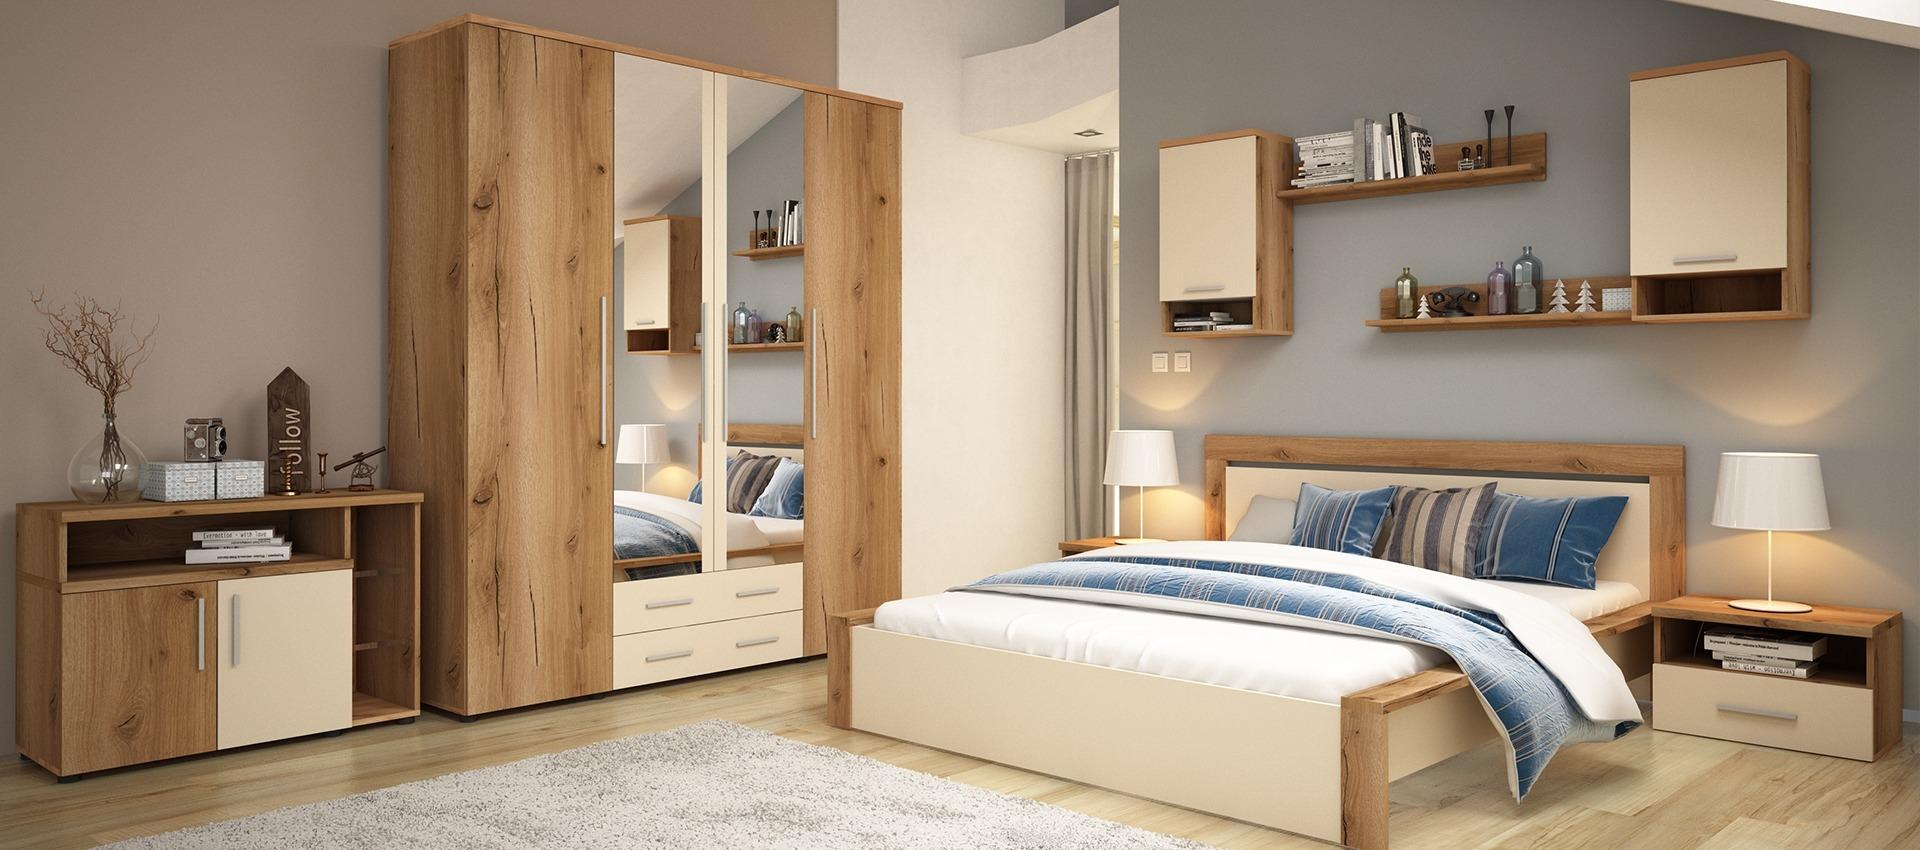 Design dormitor practic